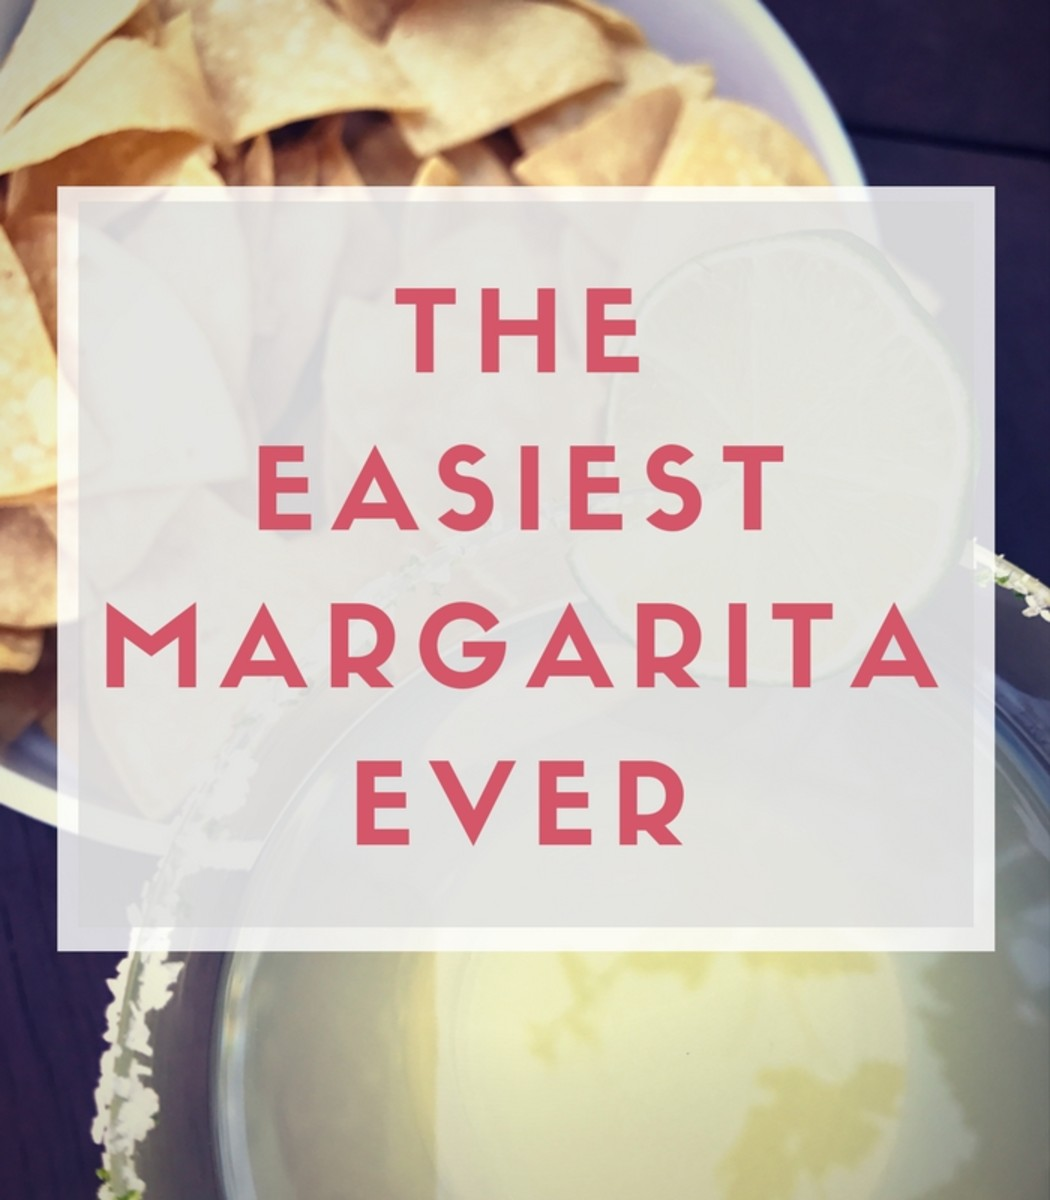 Easiest Margartia Ever